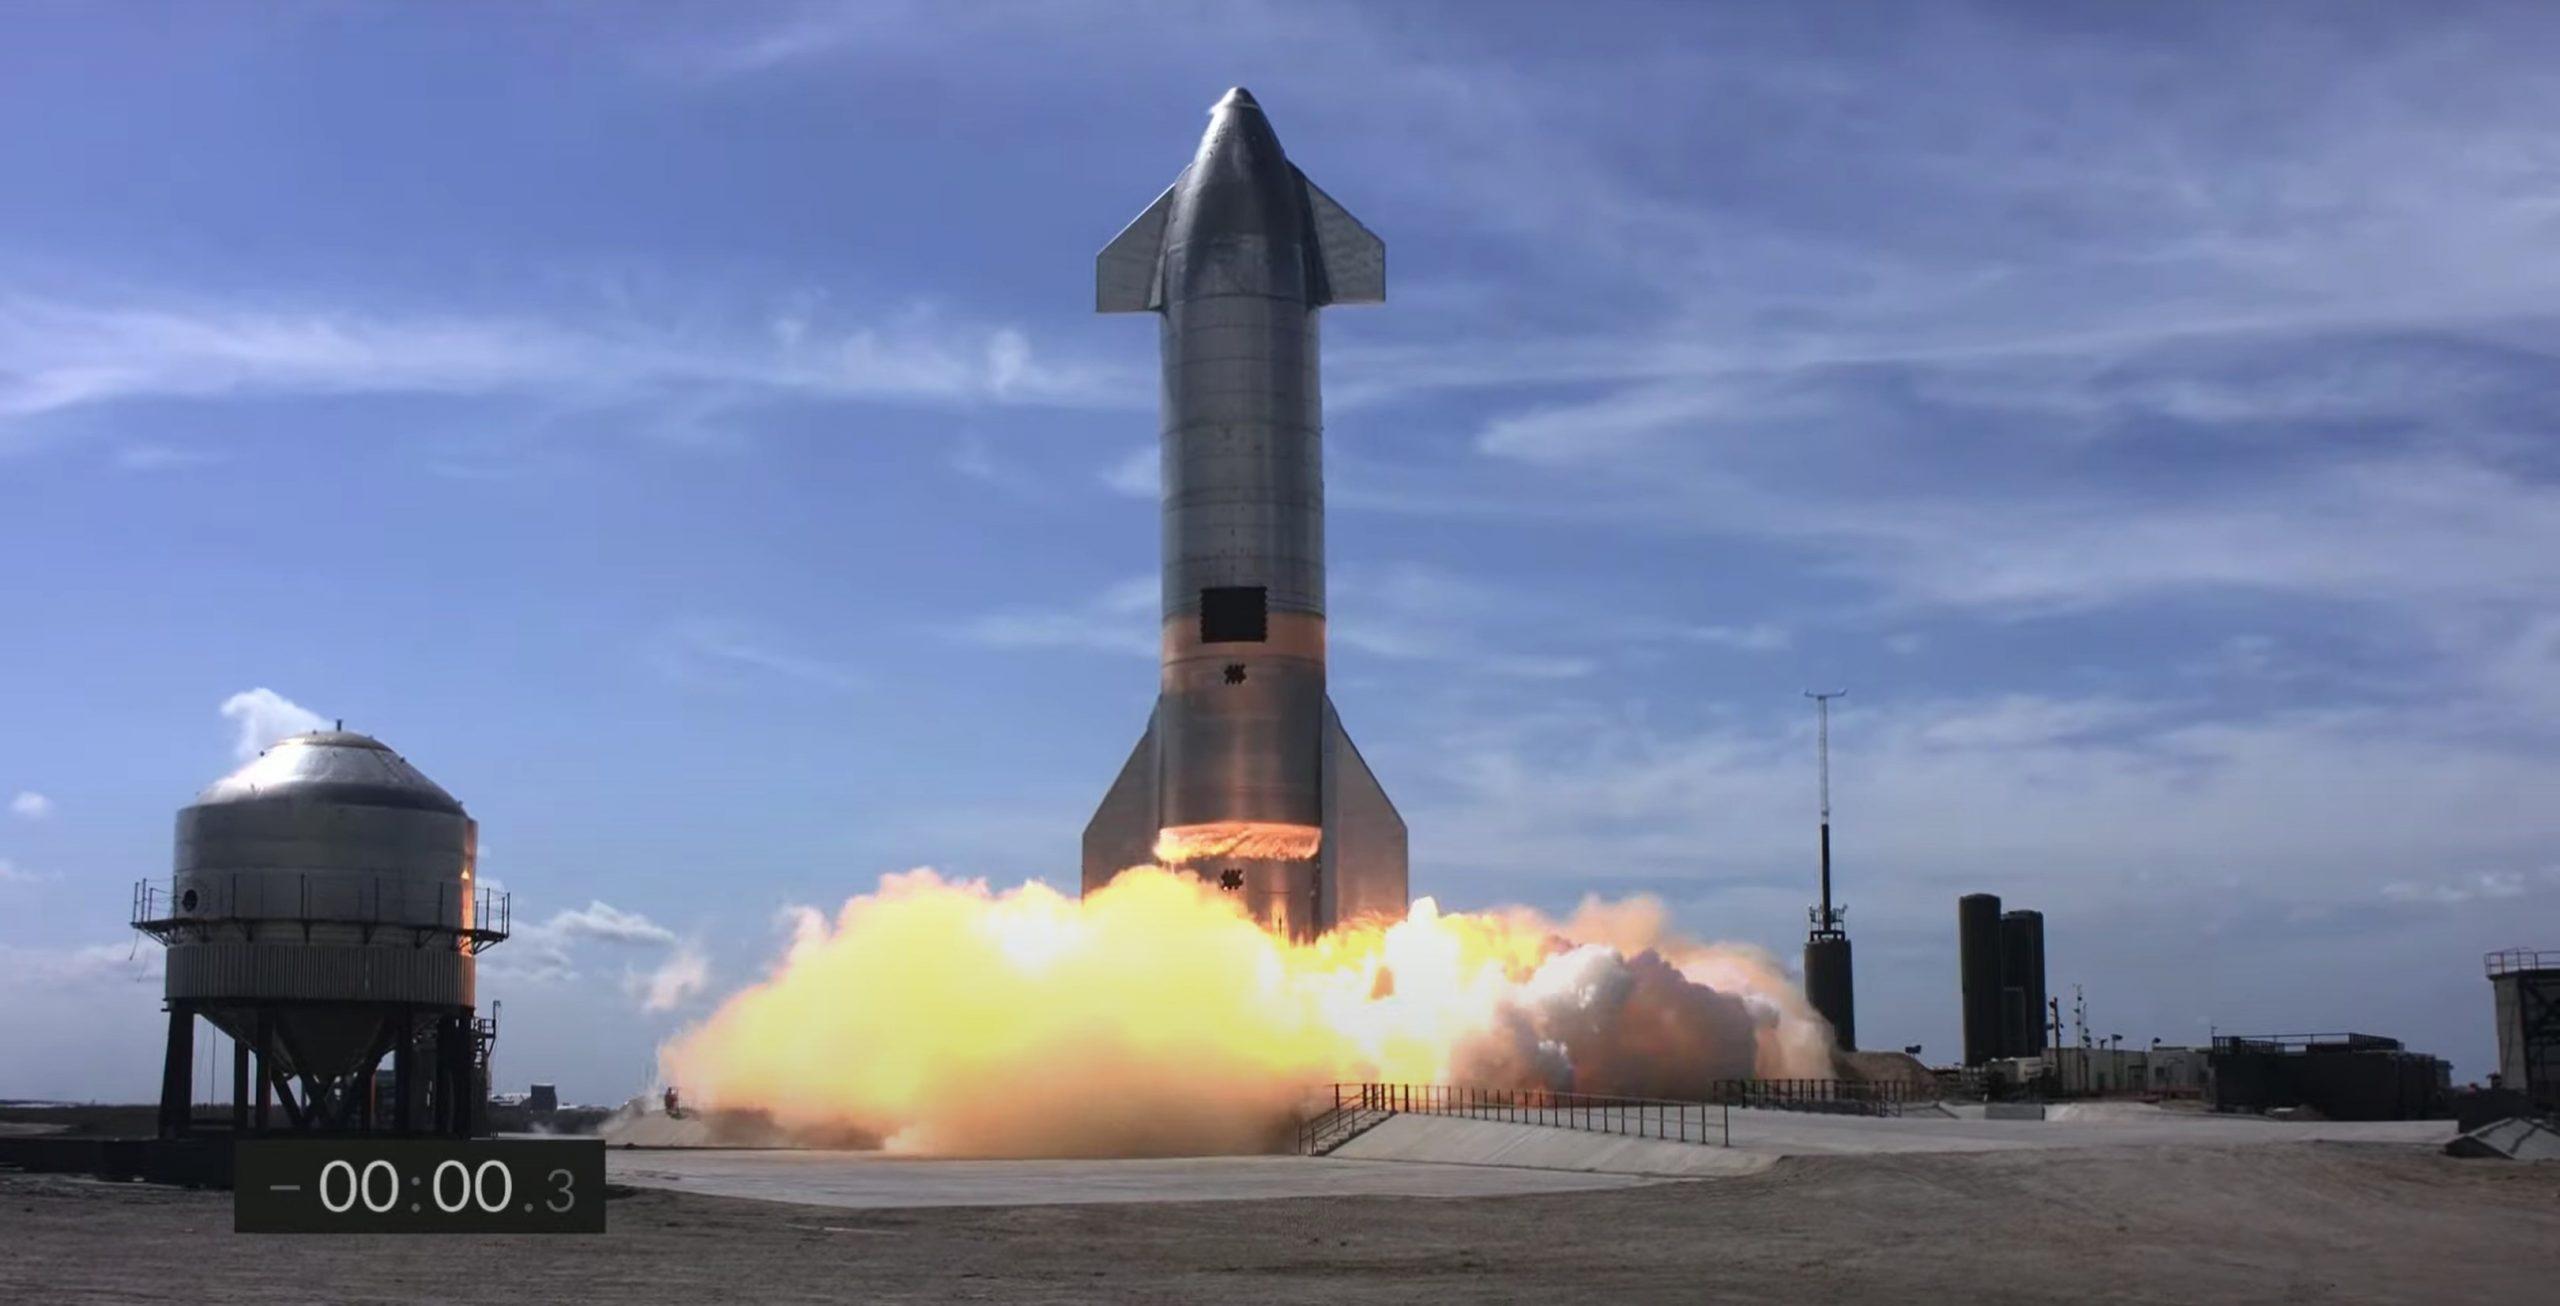 Starship SN10 030221 webcast (SpaceX) abort 2